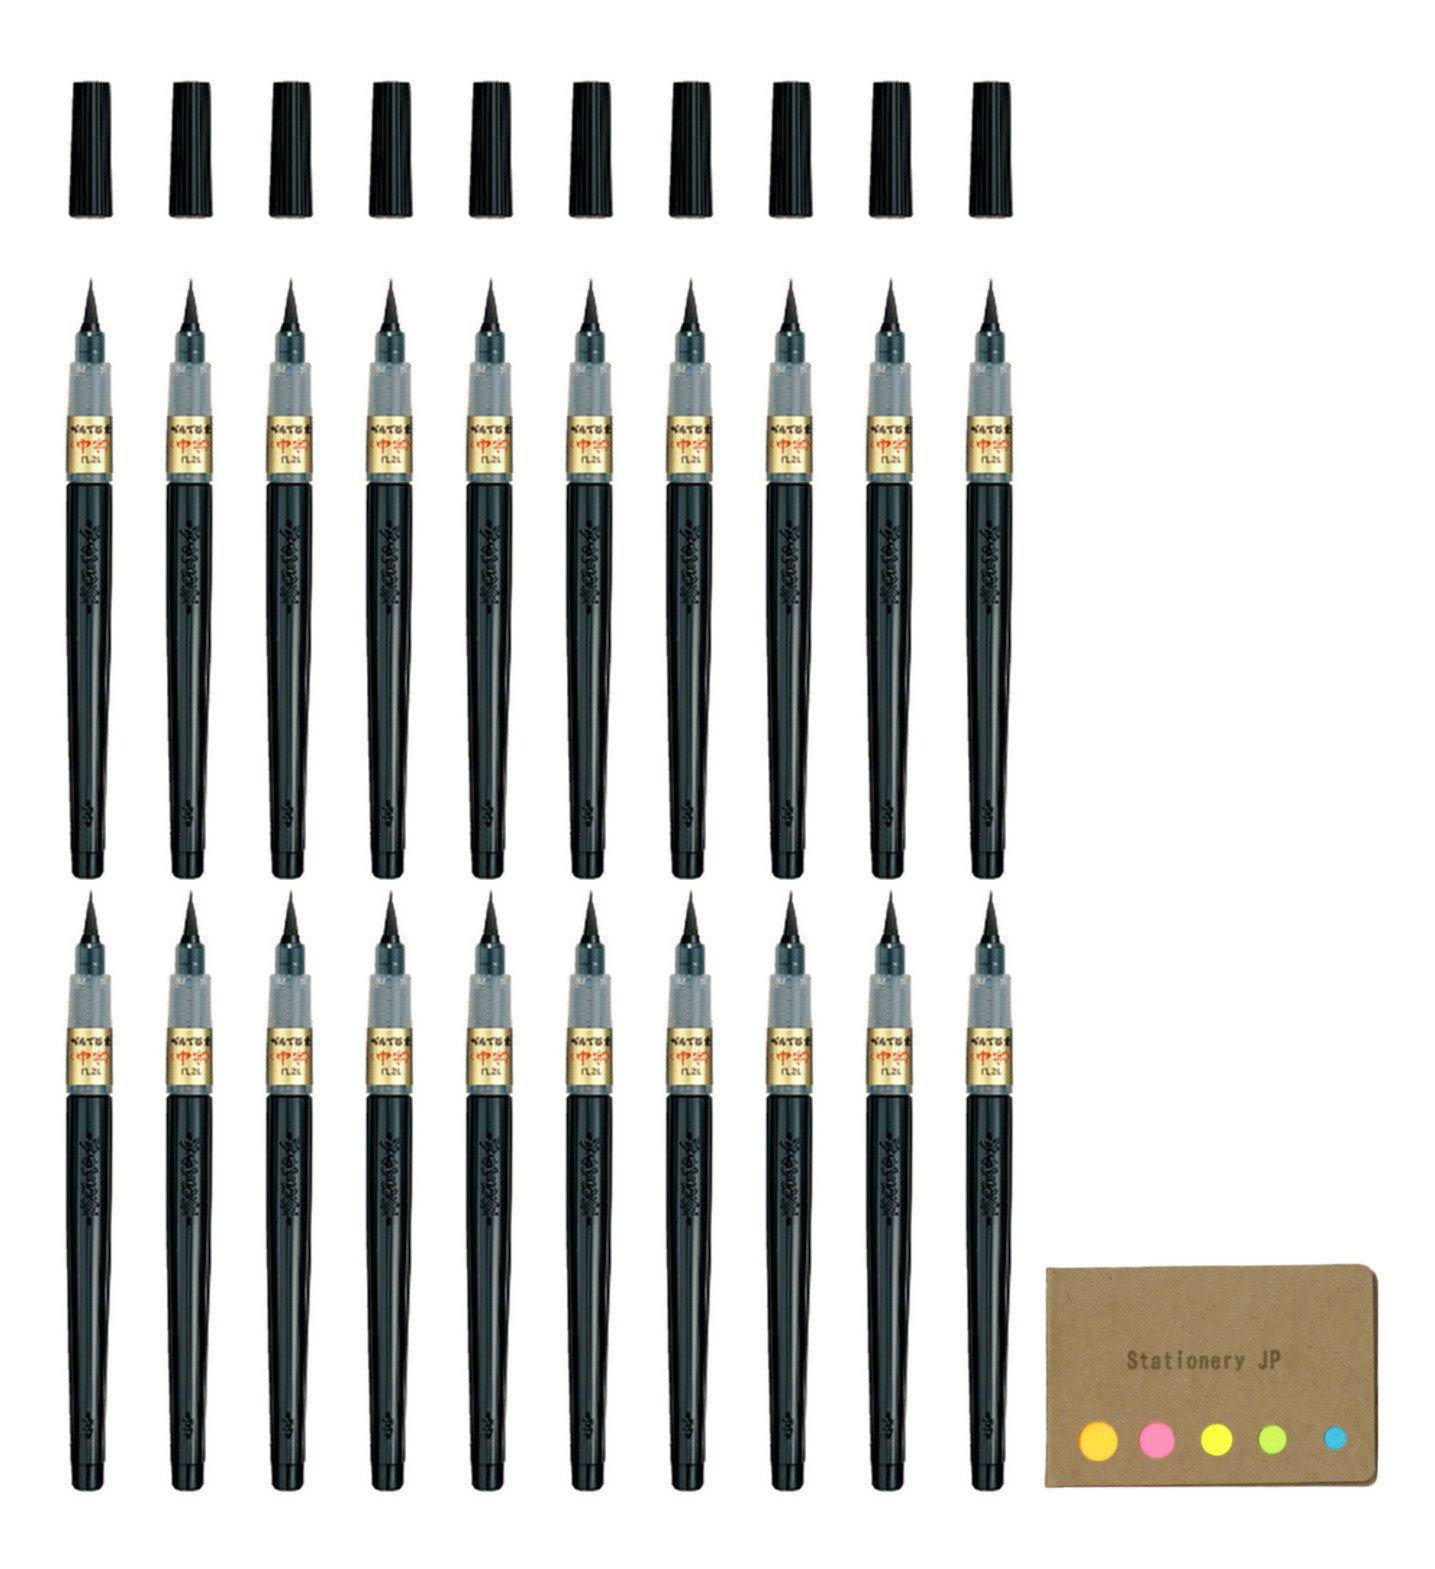 Pentel Fude Brush Pen, Medium, 20-pack, Sticky Notes Value Set